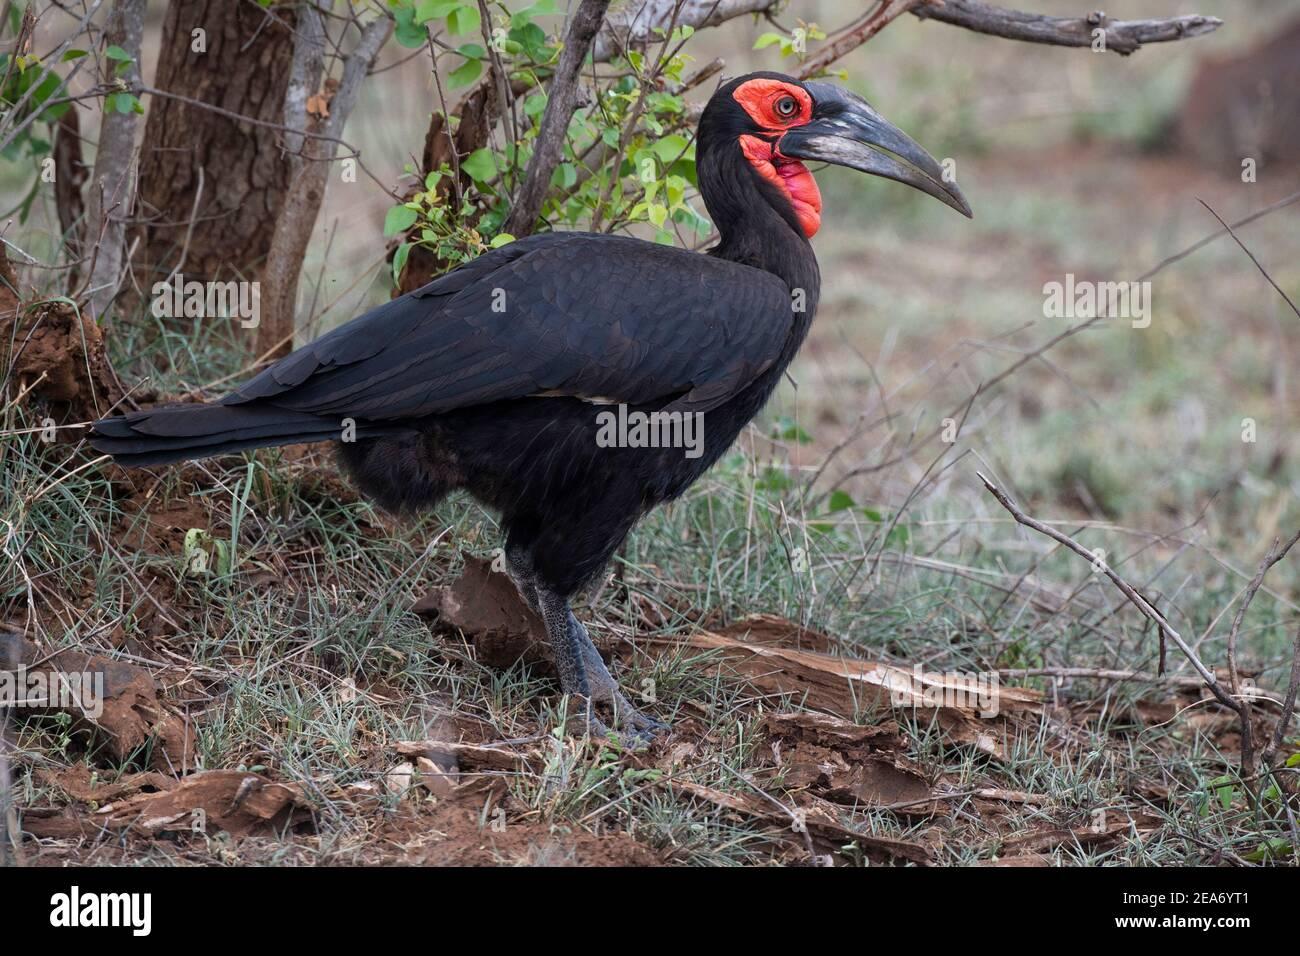 Südliche Hornrabe, Bucorvus Leadbeateri, Krüger Nationalpark, Südafrika Stockfoto